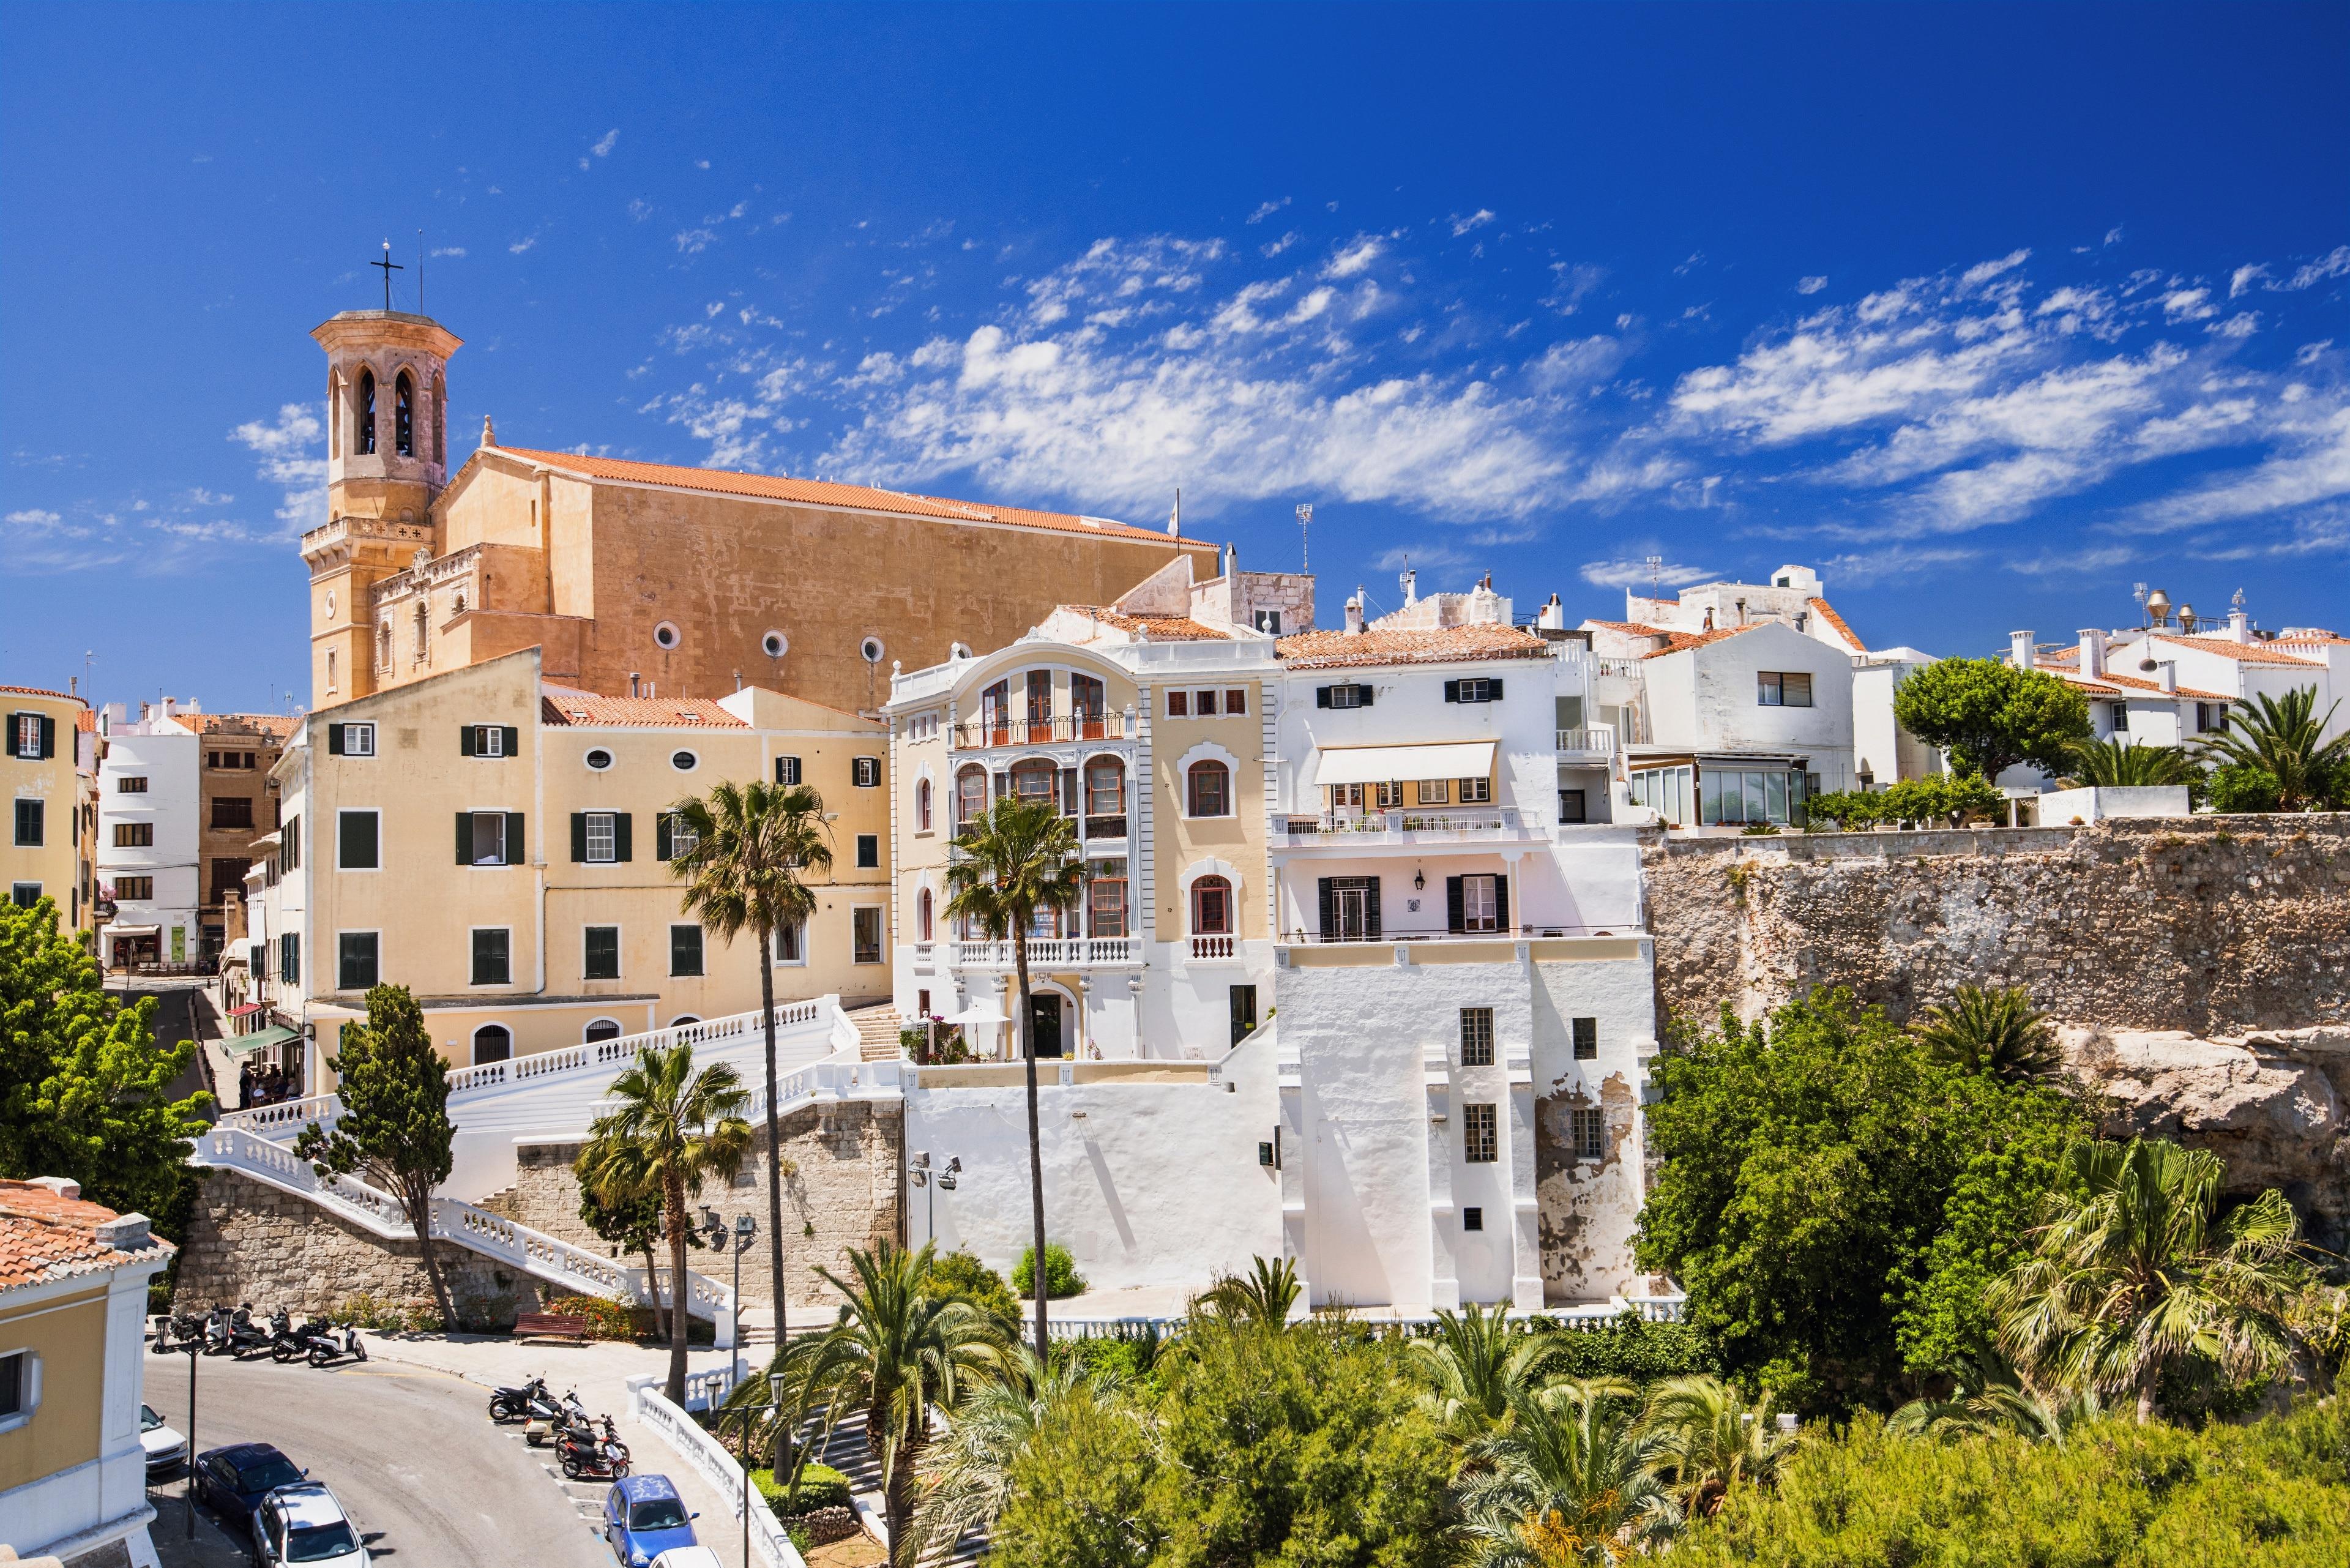 Mahon, Balearic Islands, Spain